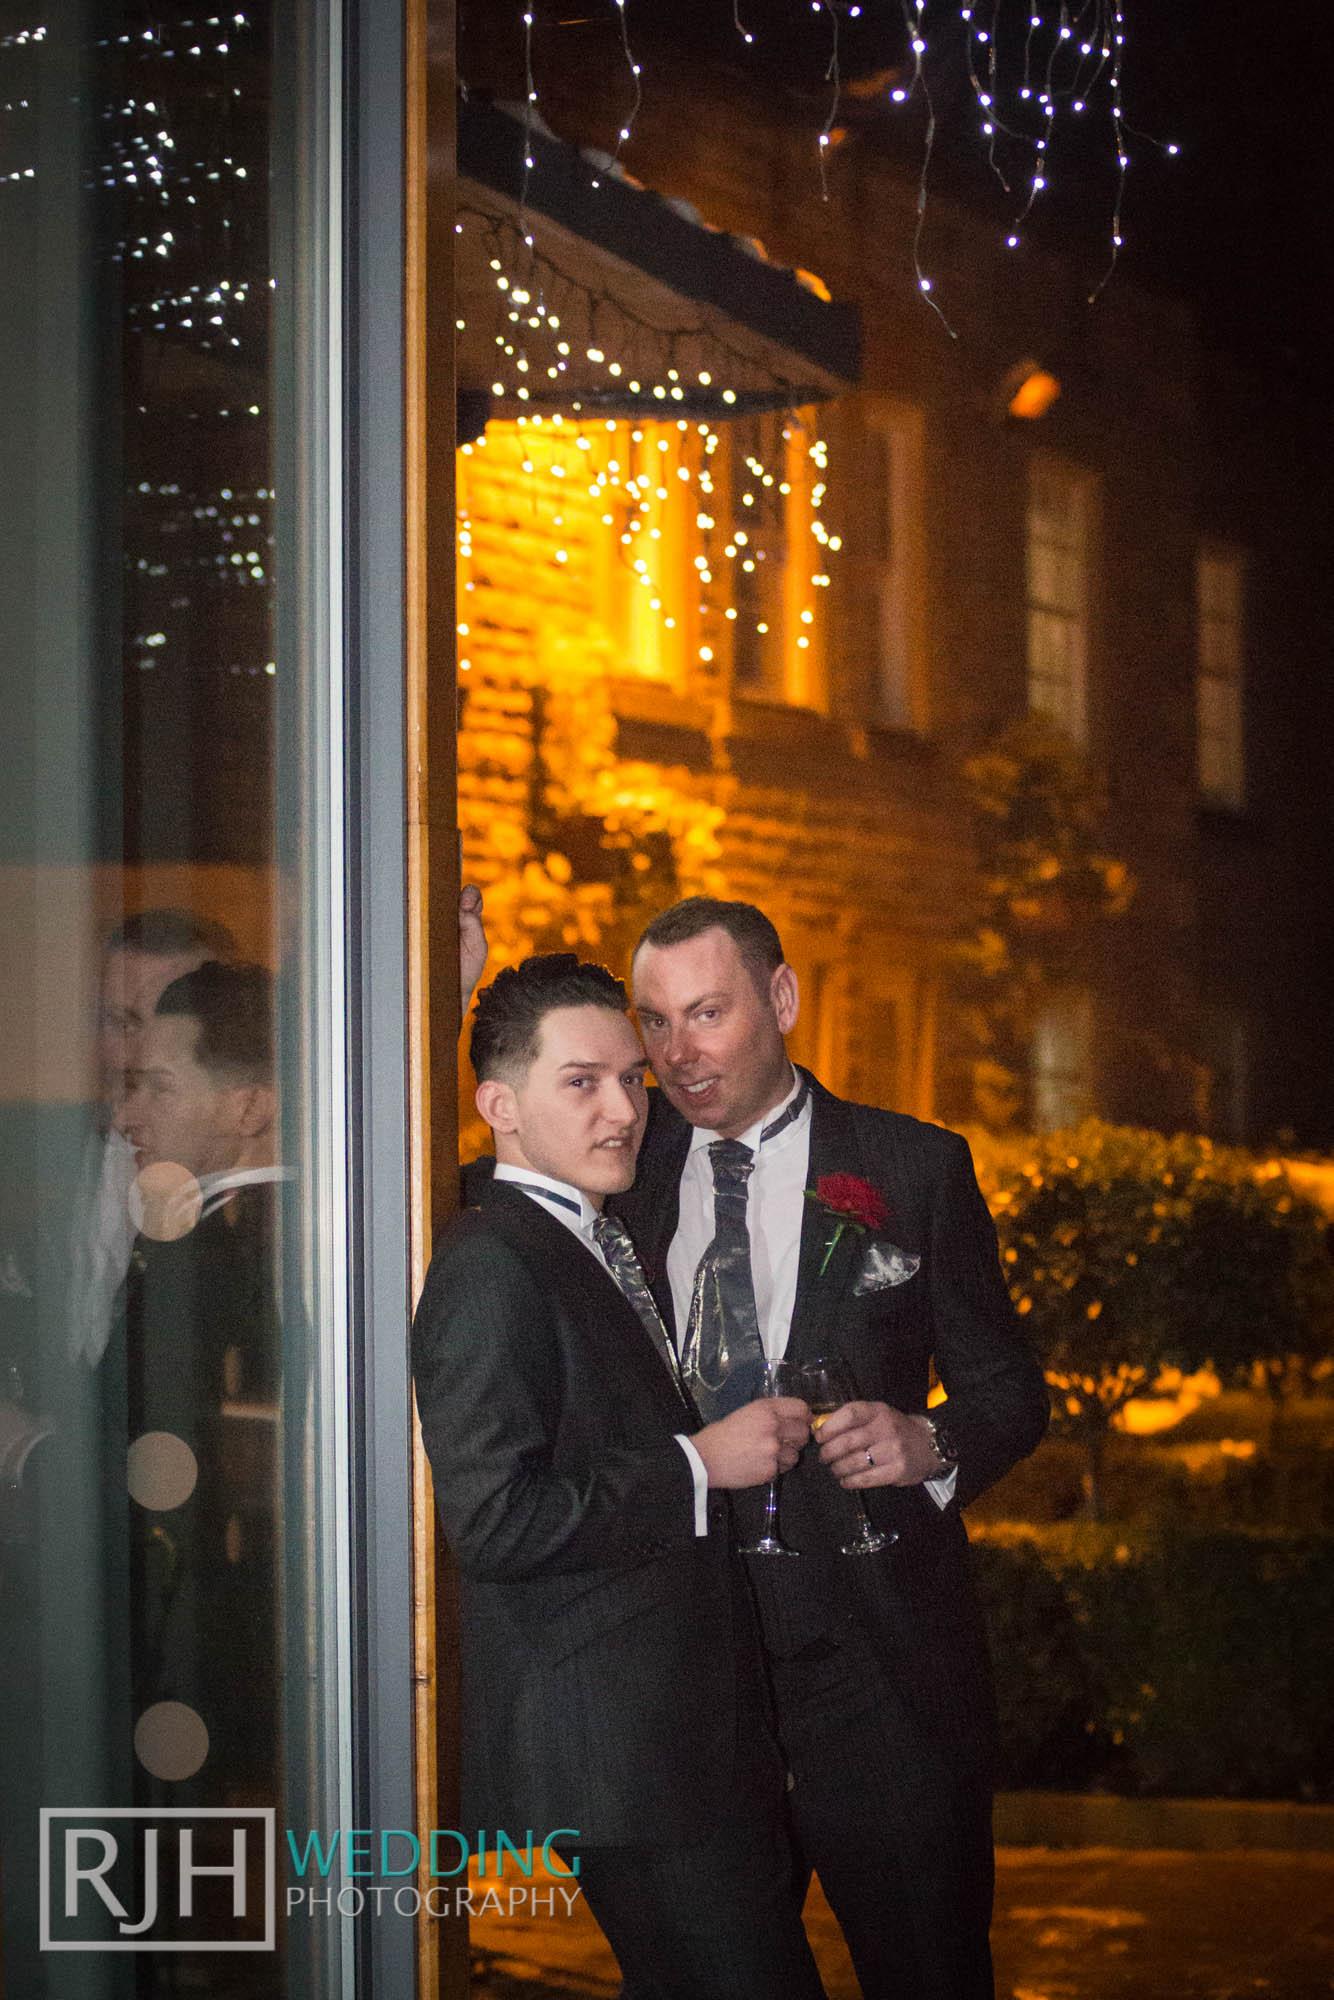 RJH Wedding Photography_2014 highlights_60.jpg